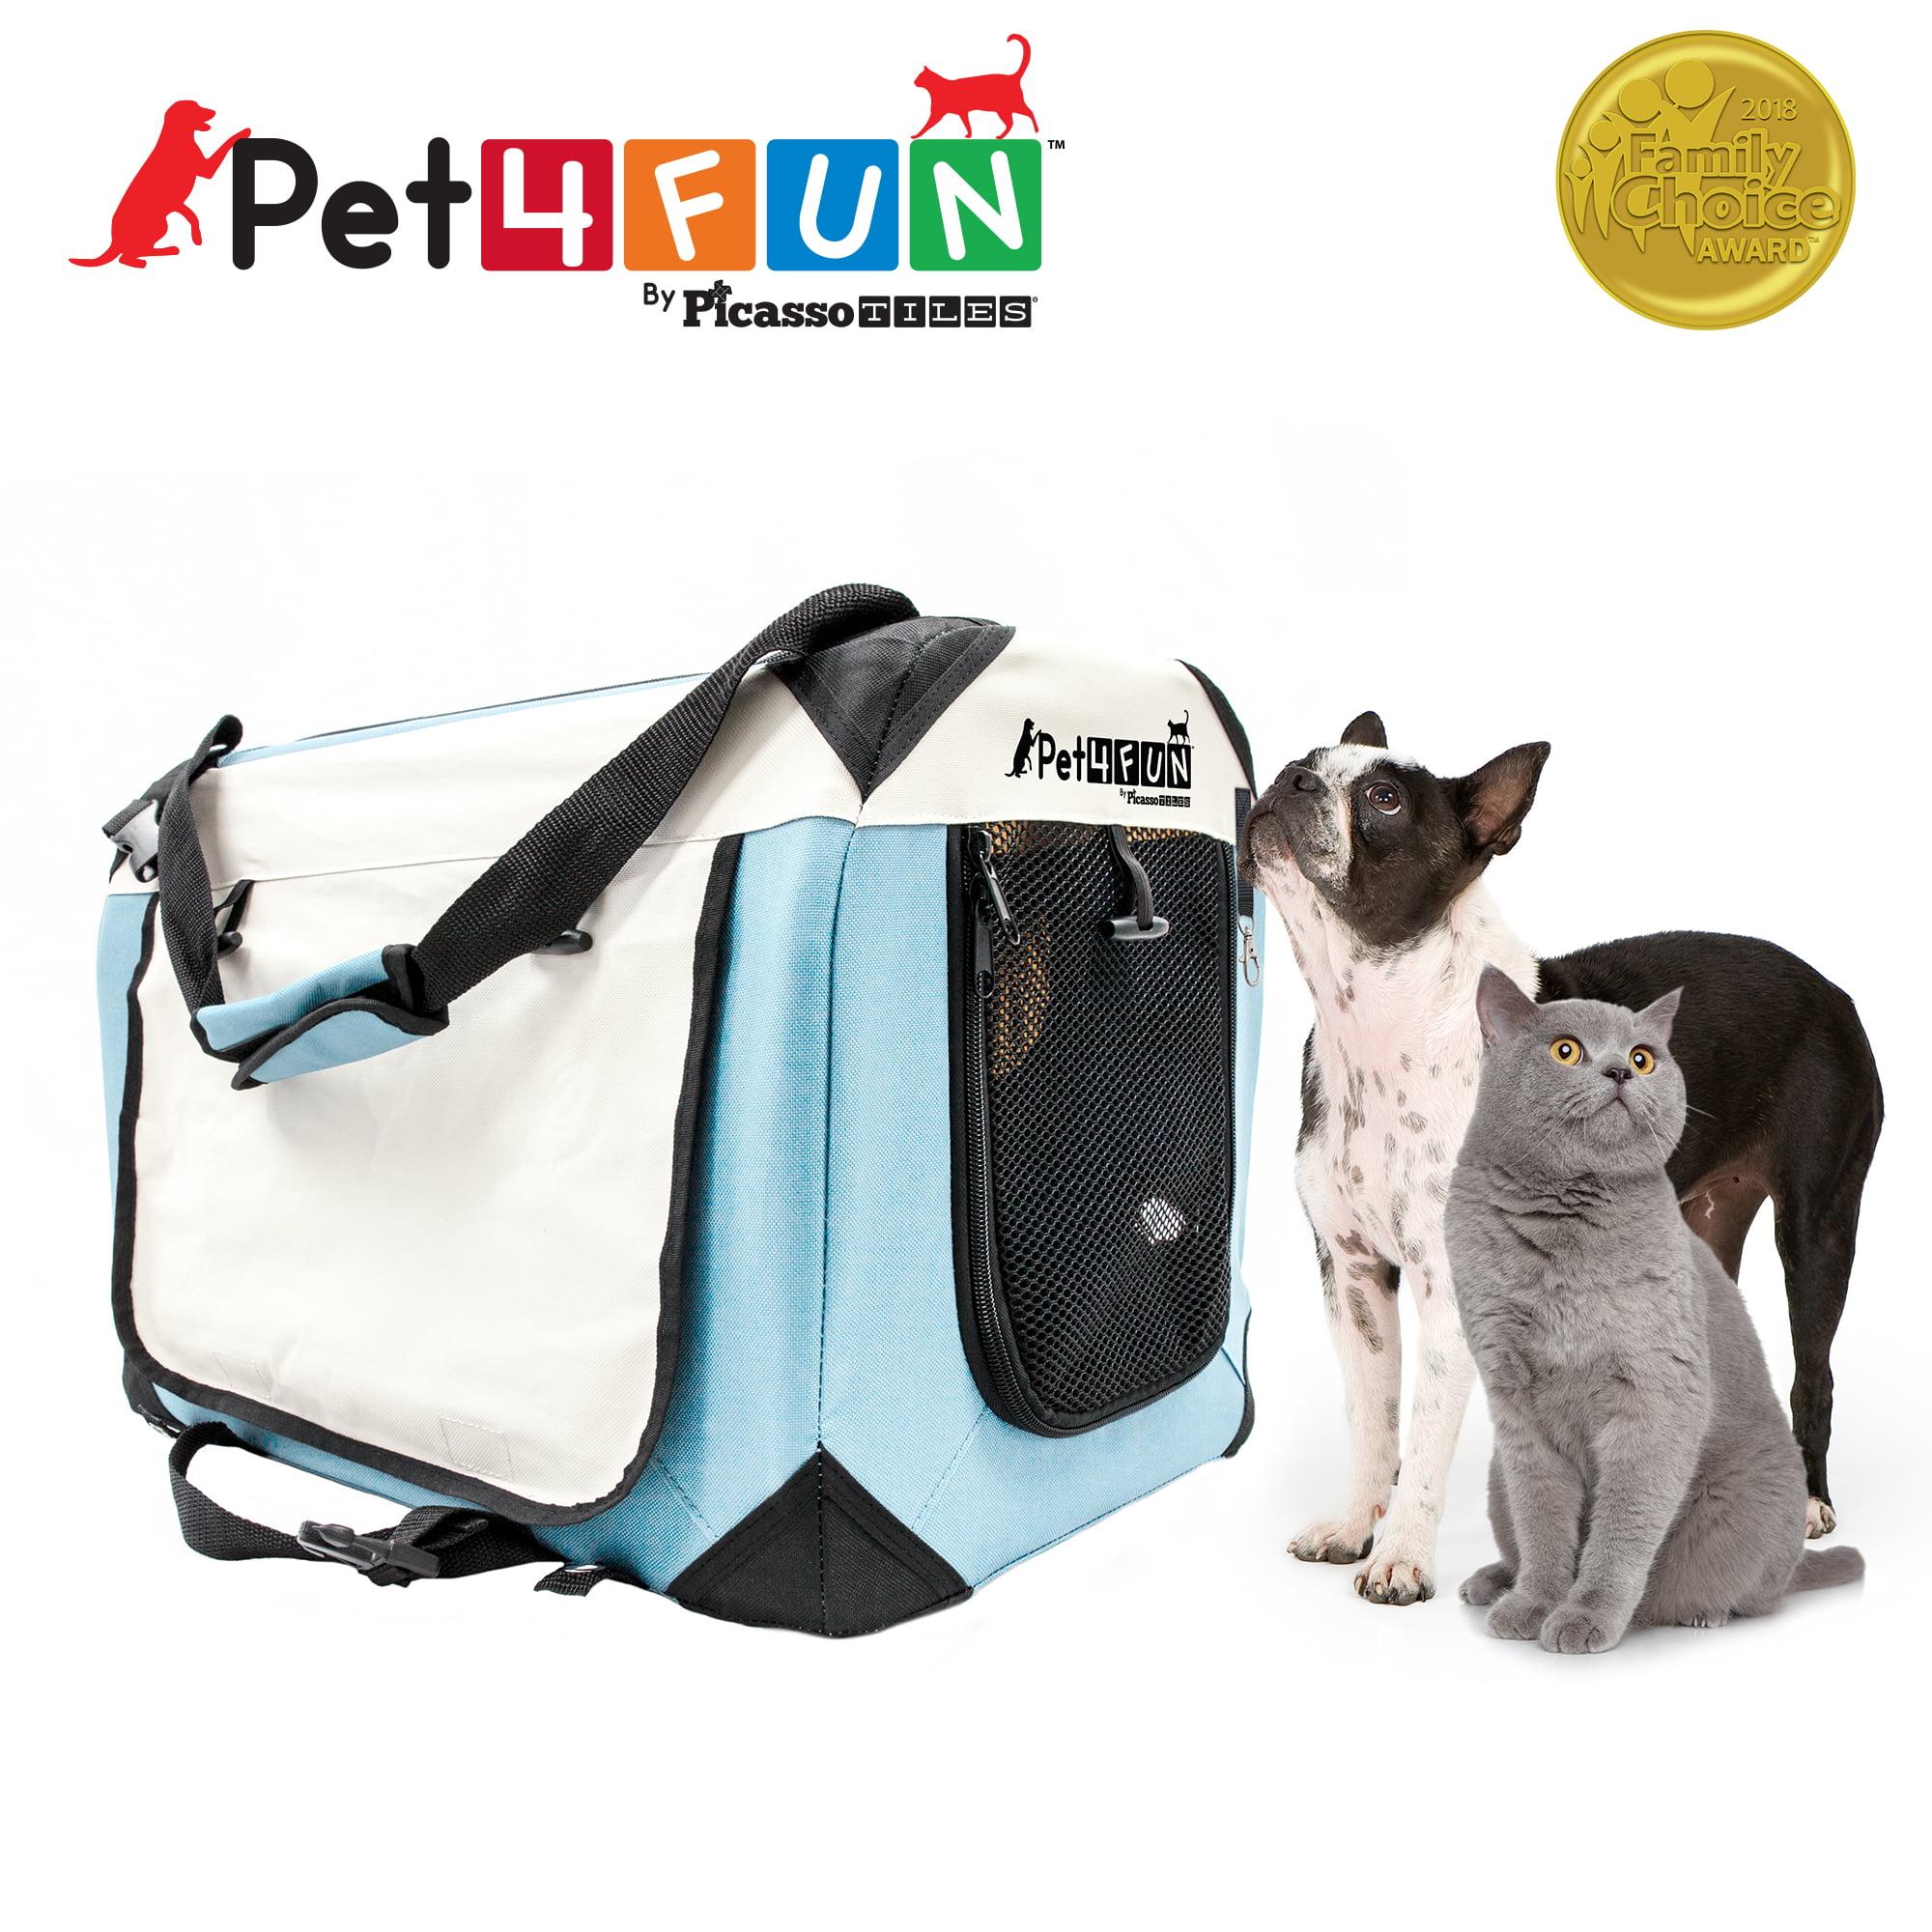 Pet4Fun PN951 Foldable Travel Crate Pet Carrier for Cat or Dog (Medium) BLUE